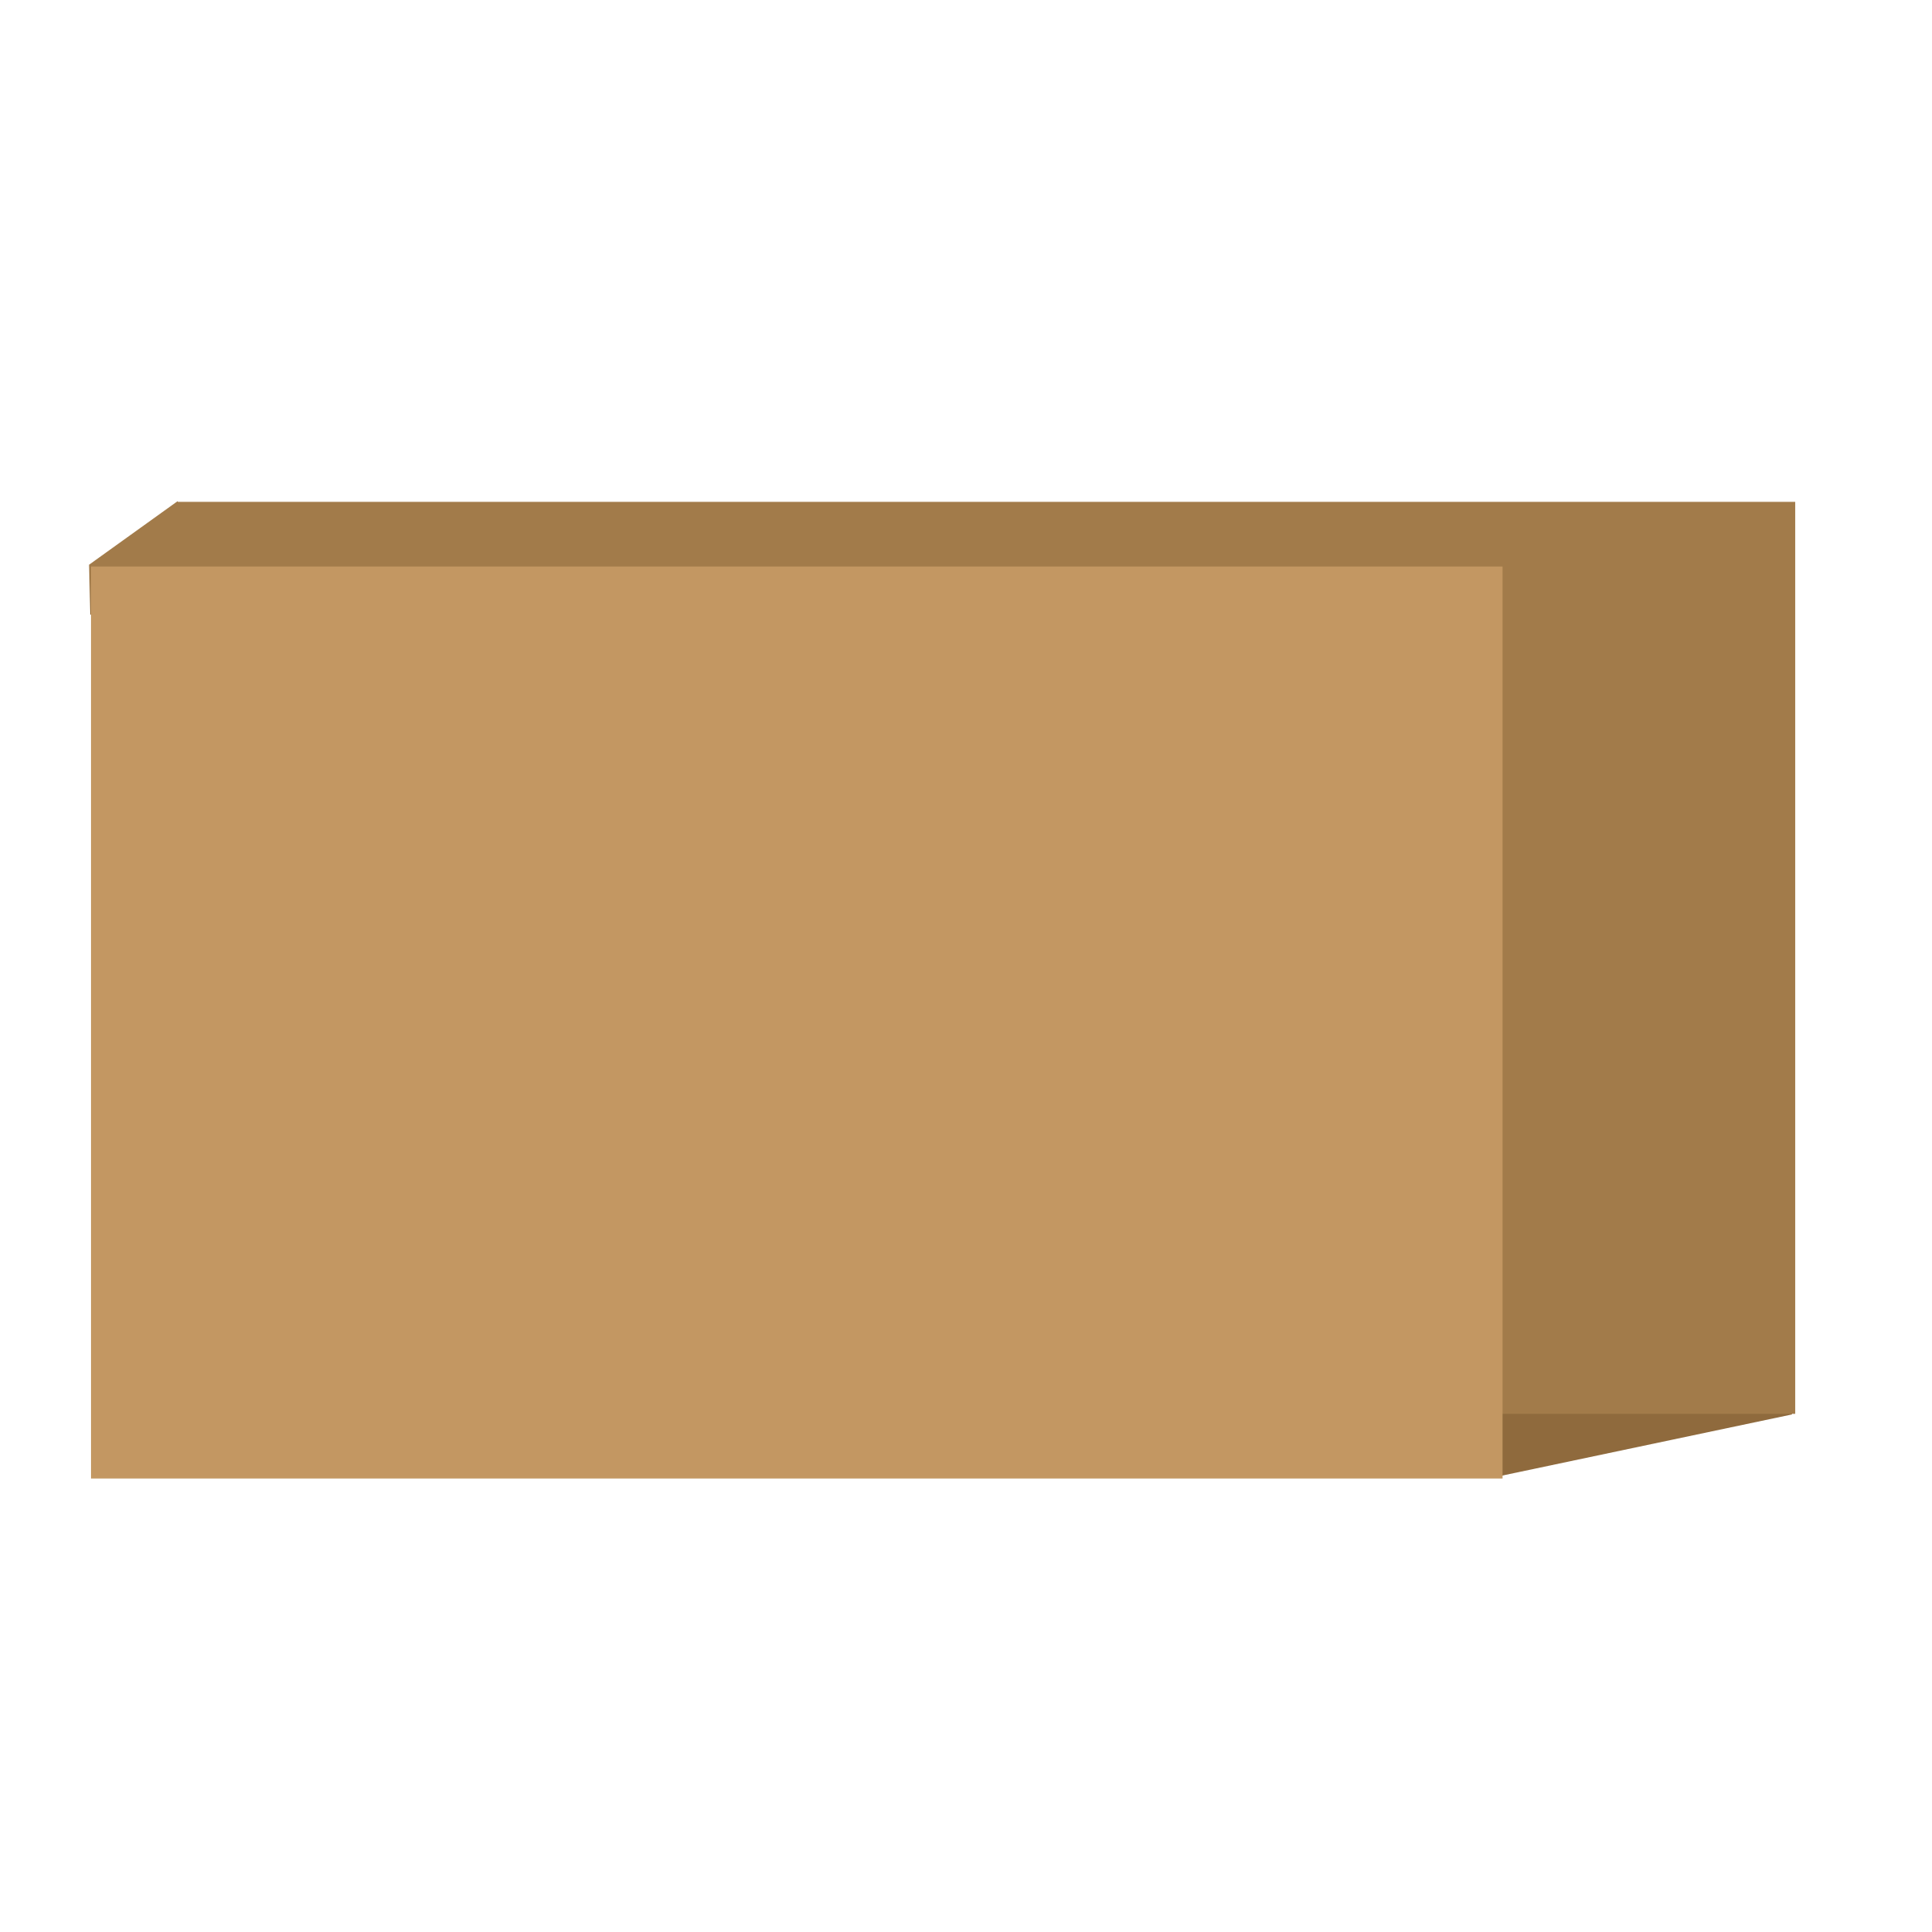 Imagination big image png. Clipart box rectangular box